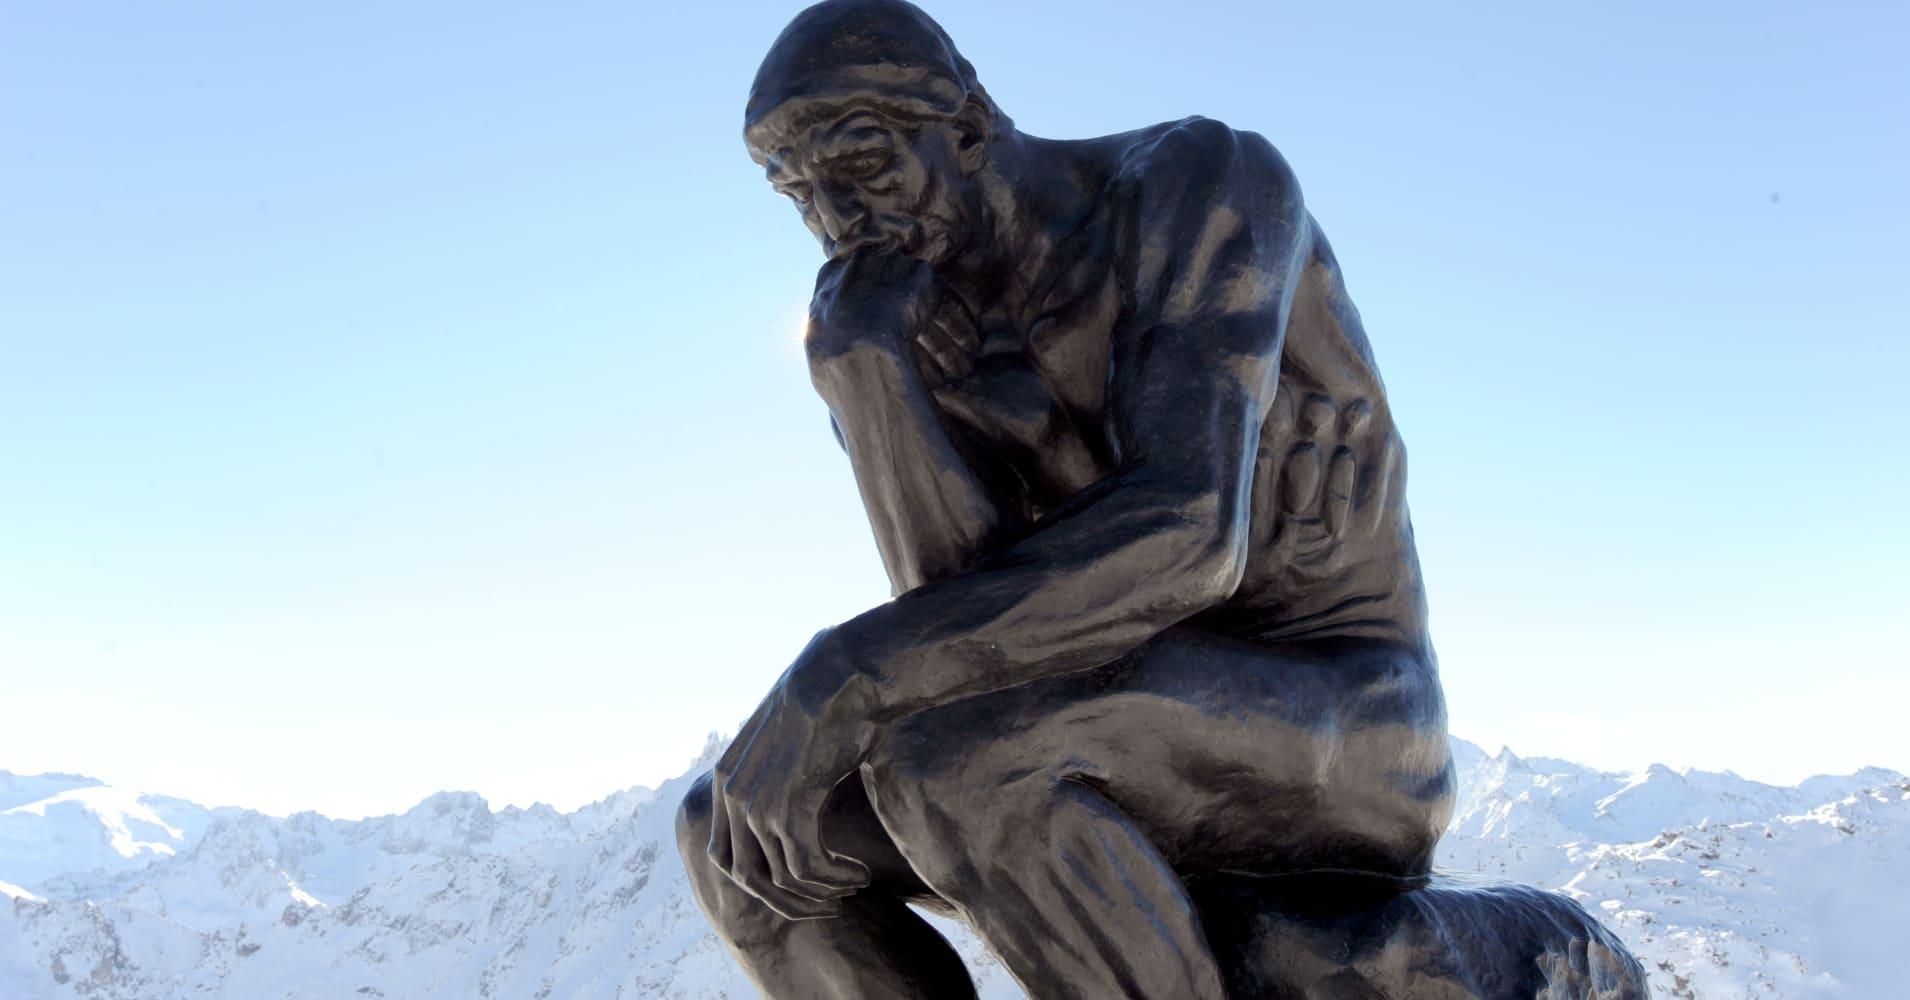 The Thinker Statue Rodin